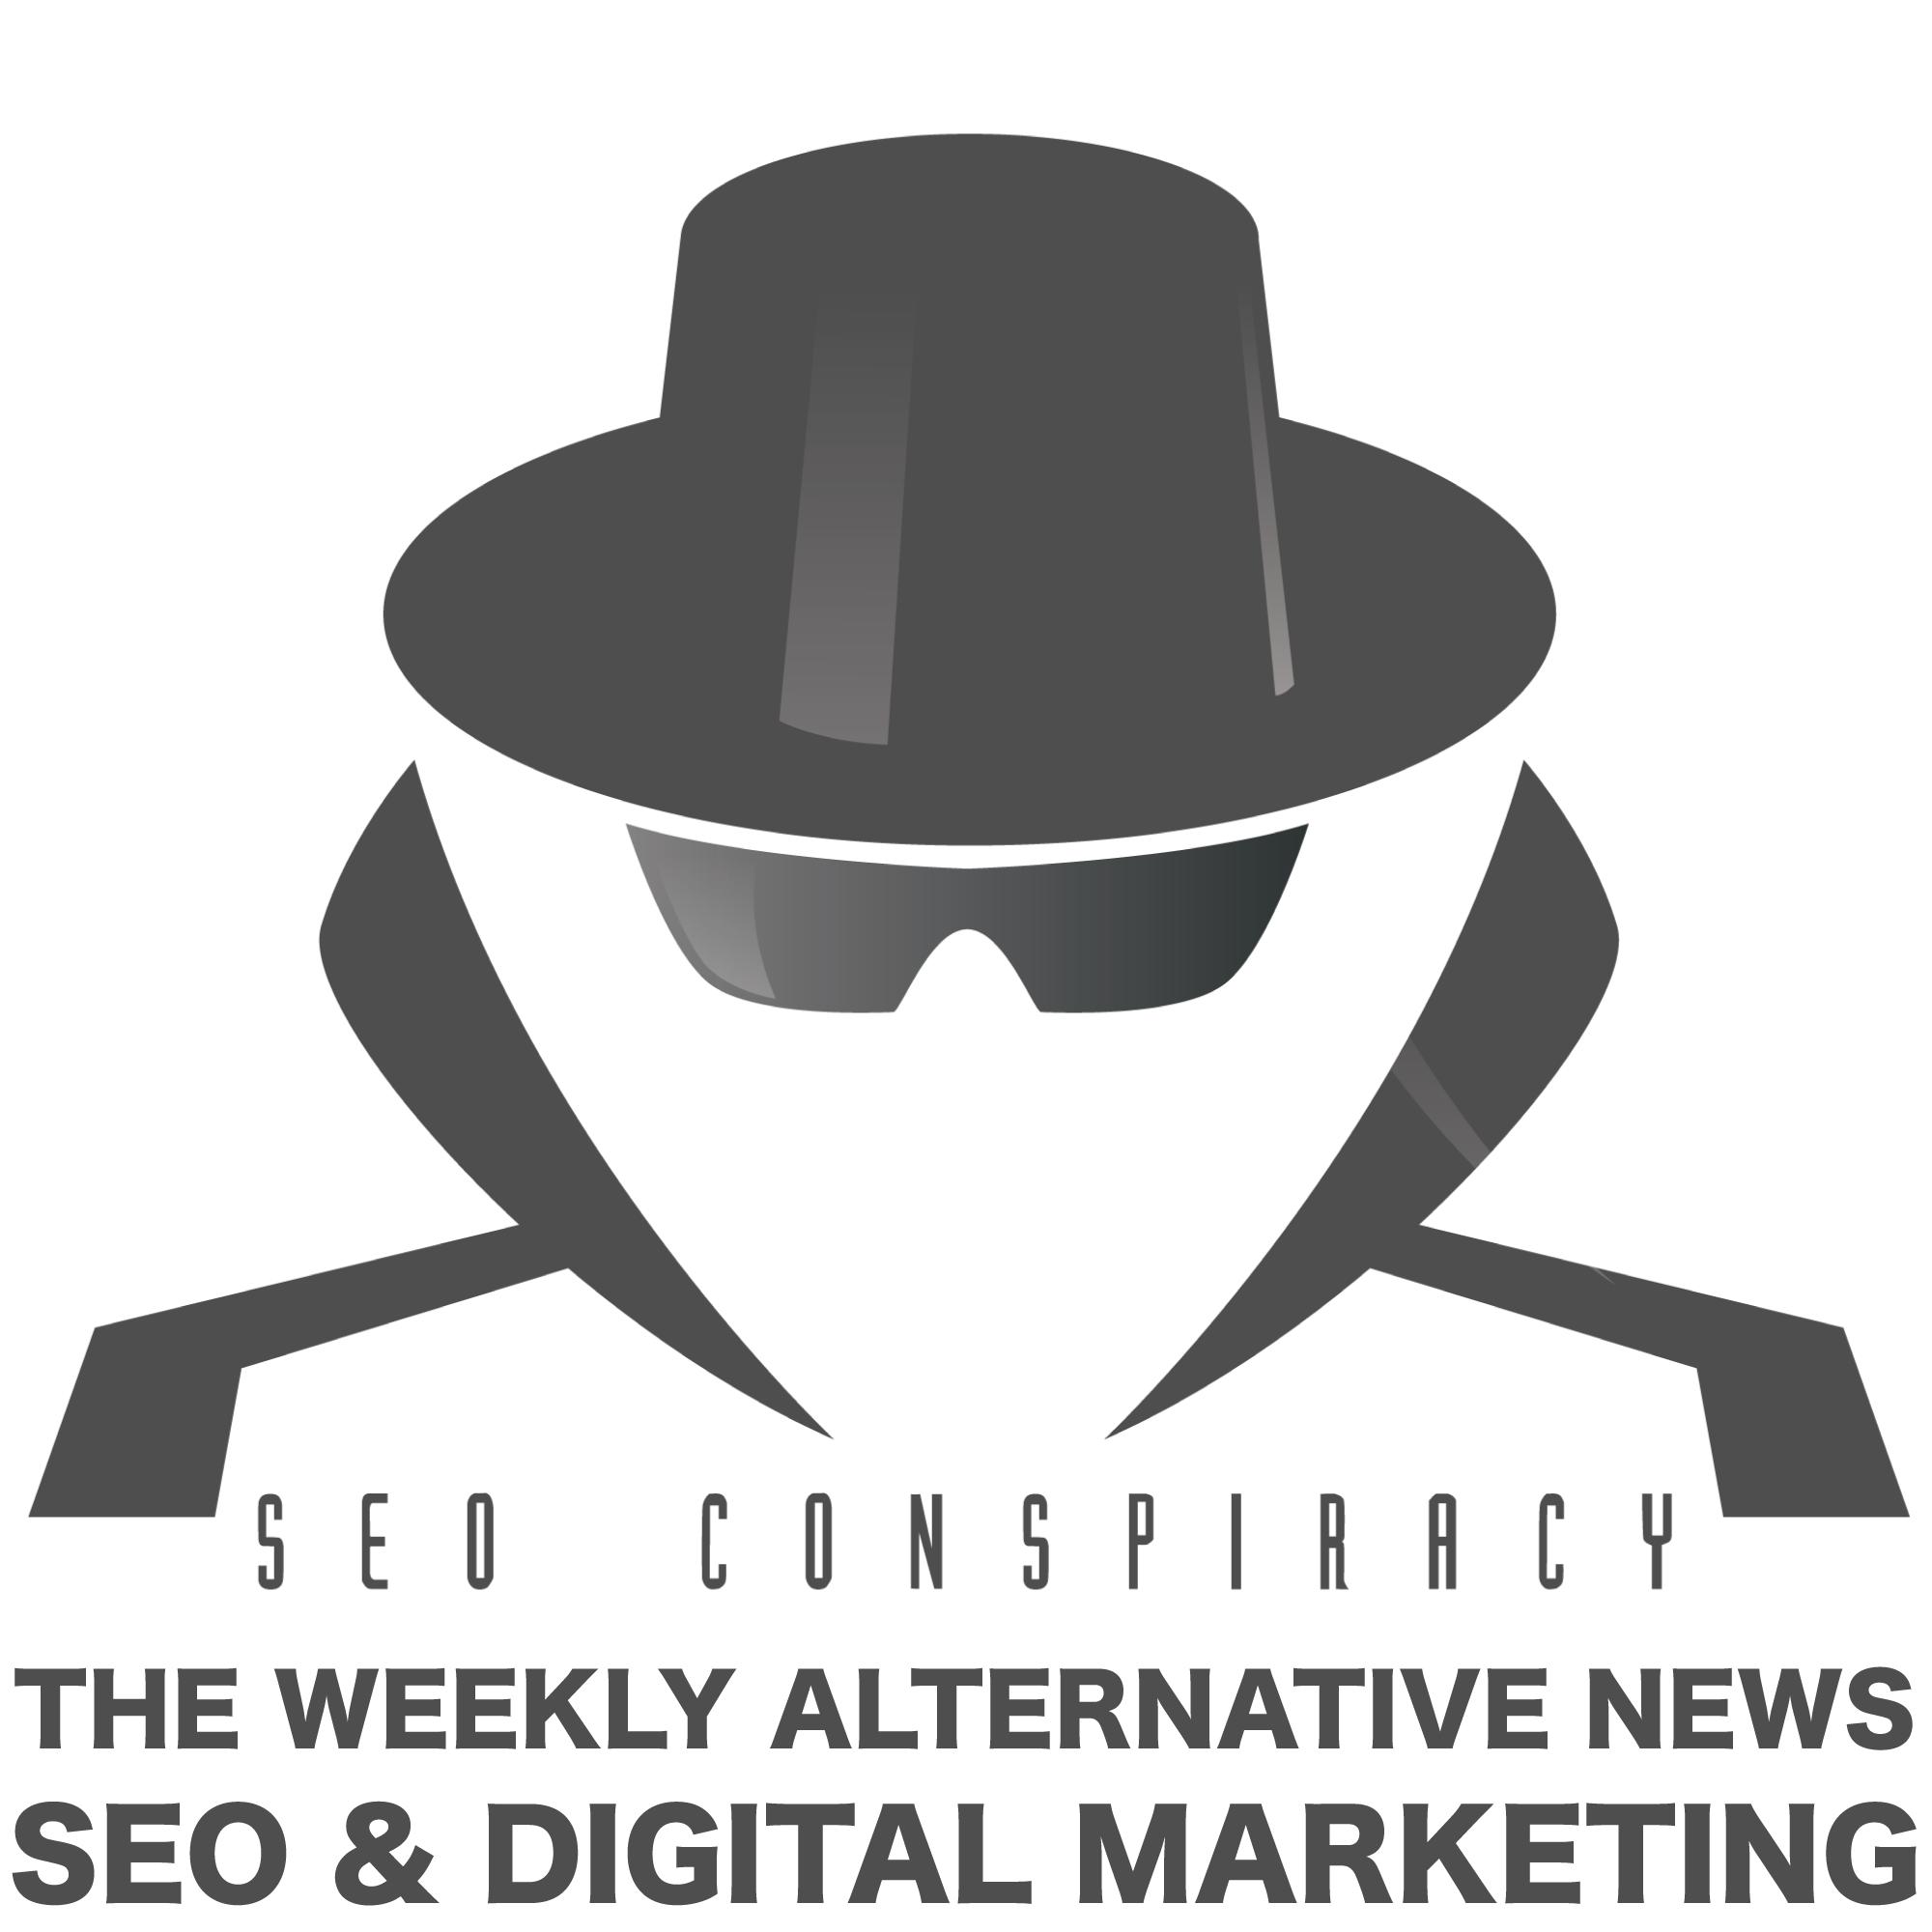 Back Market SEO Strategy Revealed - New Google Update Striking? Alternative Search News 2020